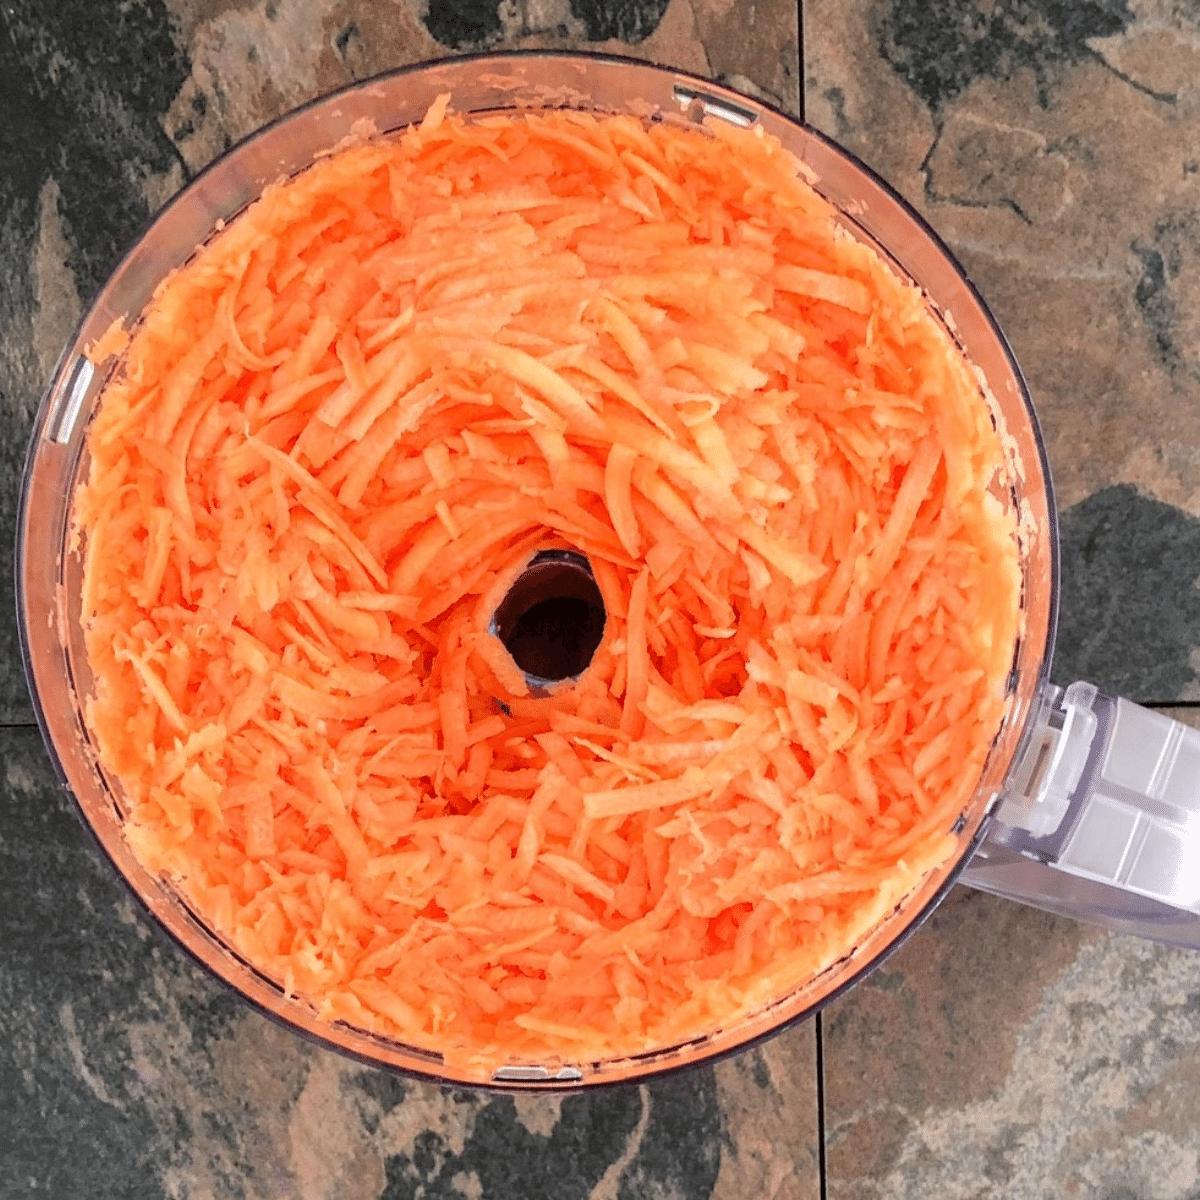 Freshly shredded carrots in the food processor